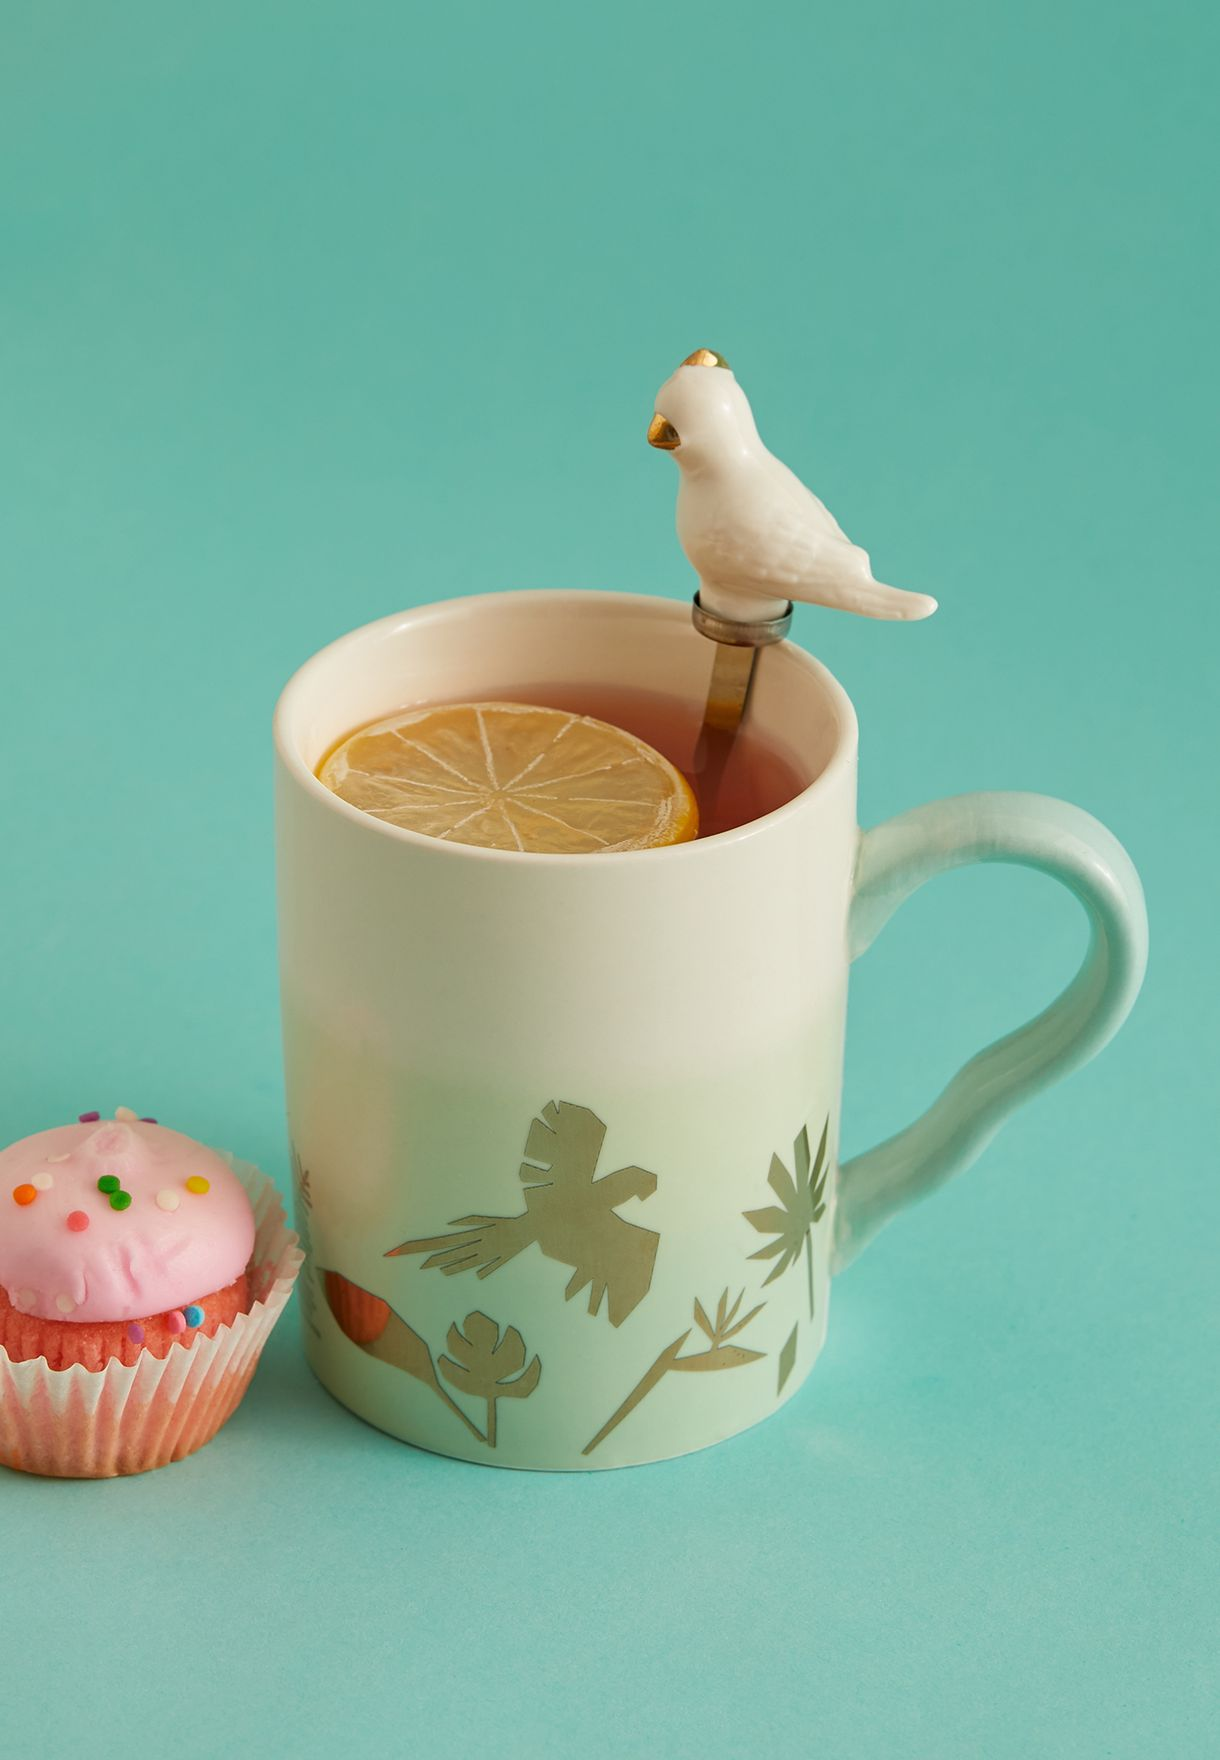 Parrot Mug With Ceramic Spoon